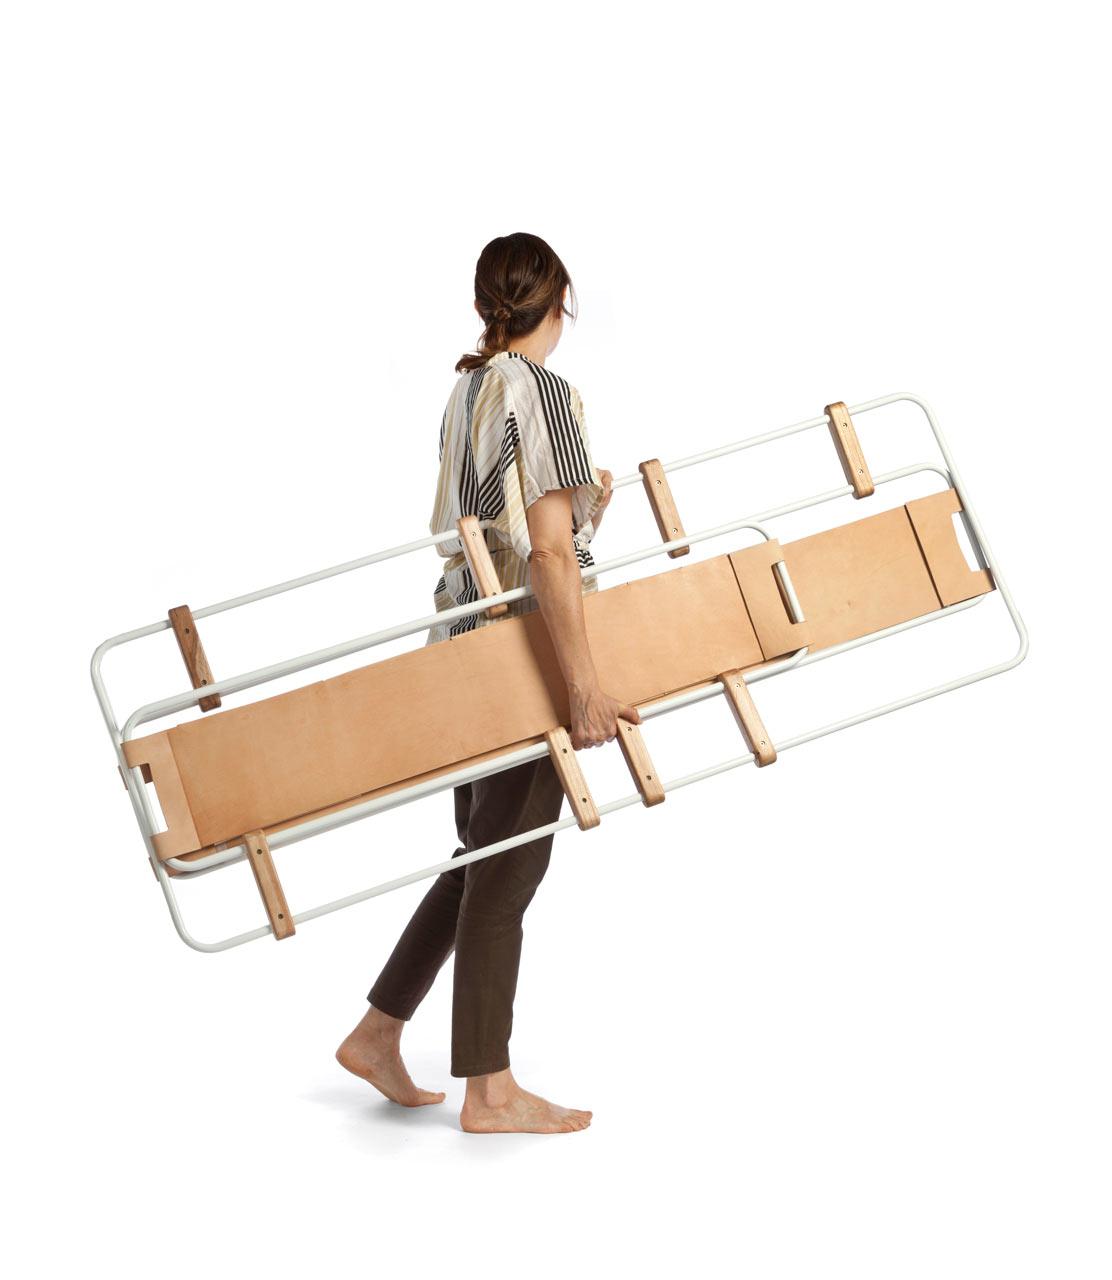 modular system furniture. Nomad Furniture 2 Modular System A